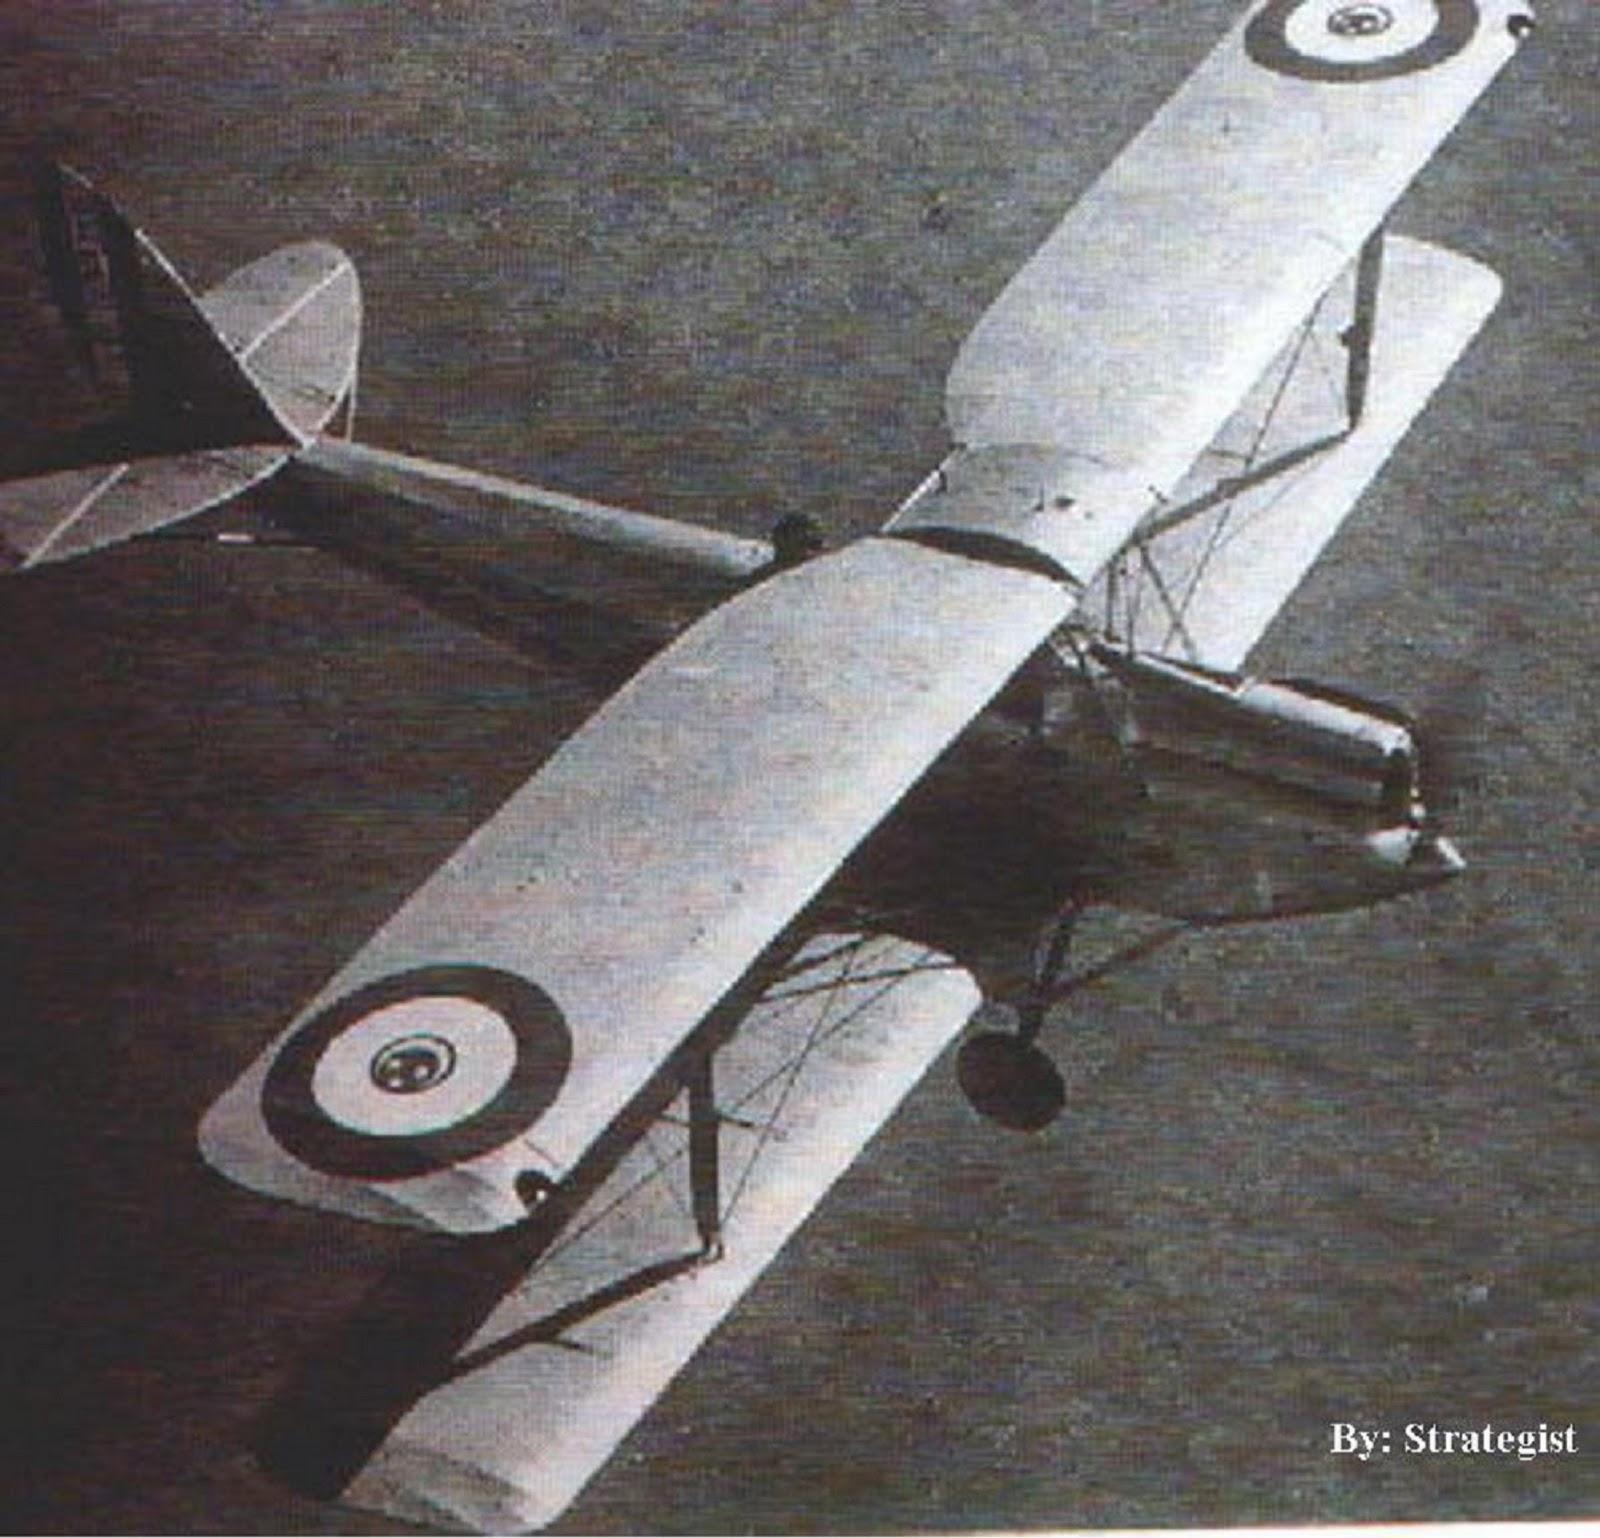 1a-de+Havilland+DH.60+Moth-1931.jpg